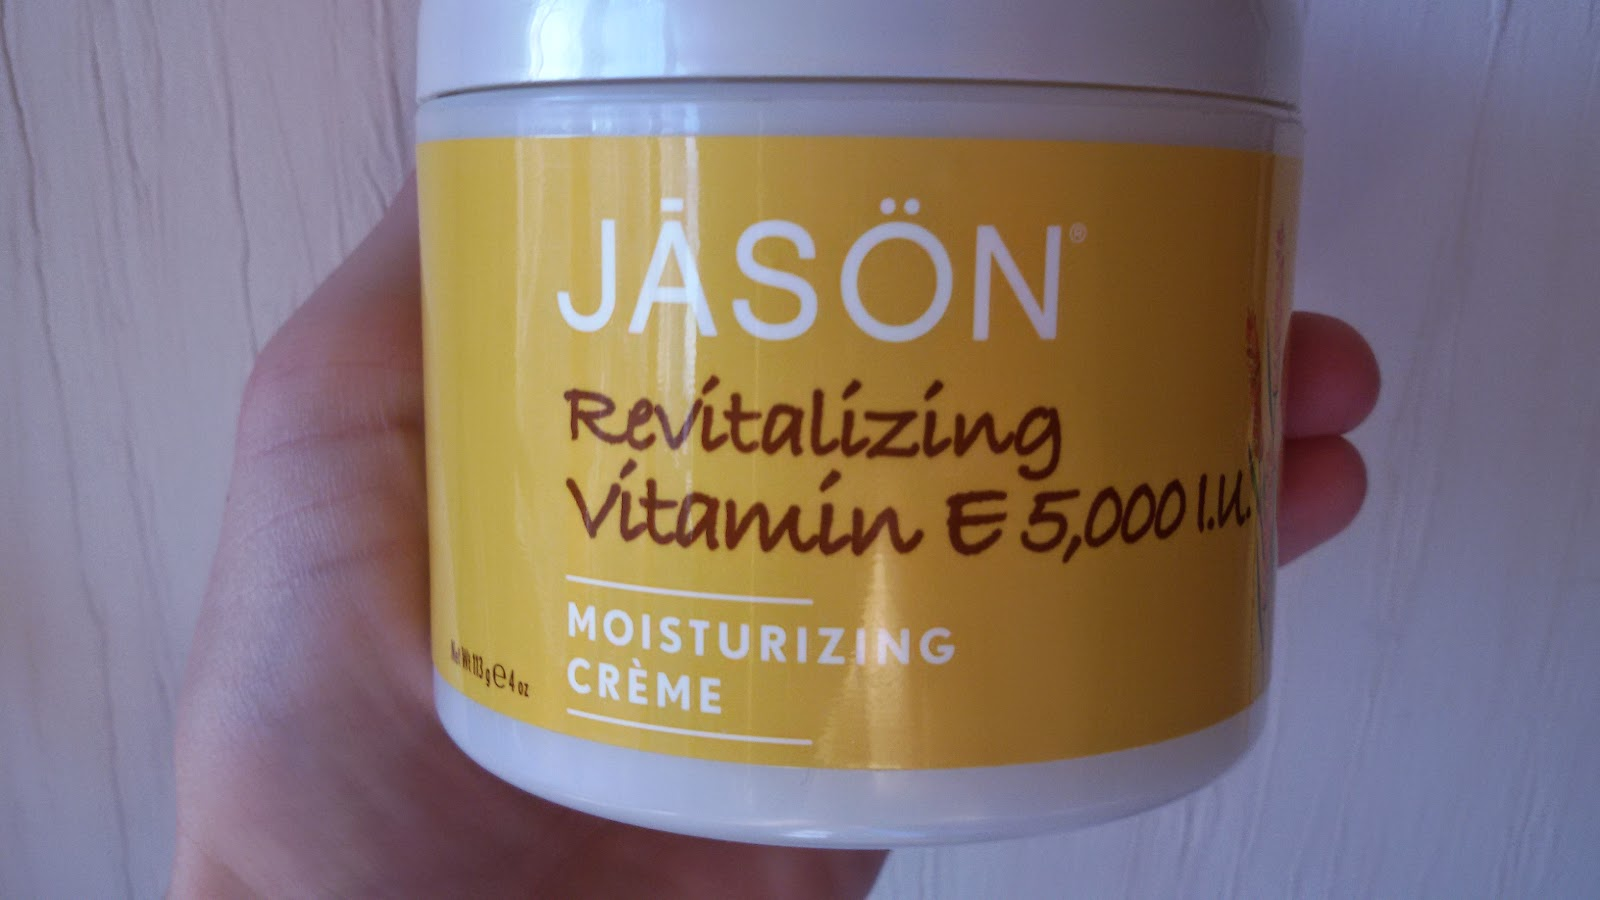 Jason Revitalising Vitamin E 5000 Moisturising Creme: Когда крем не подходит